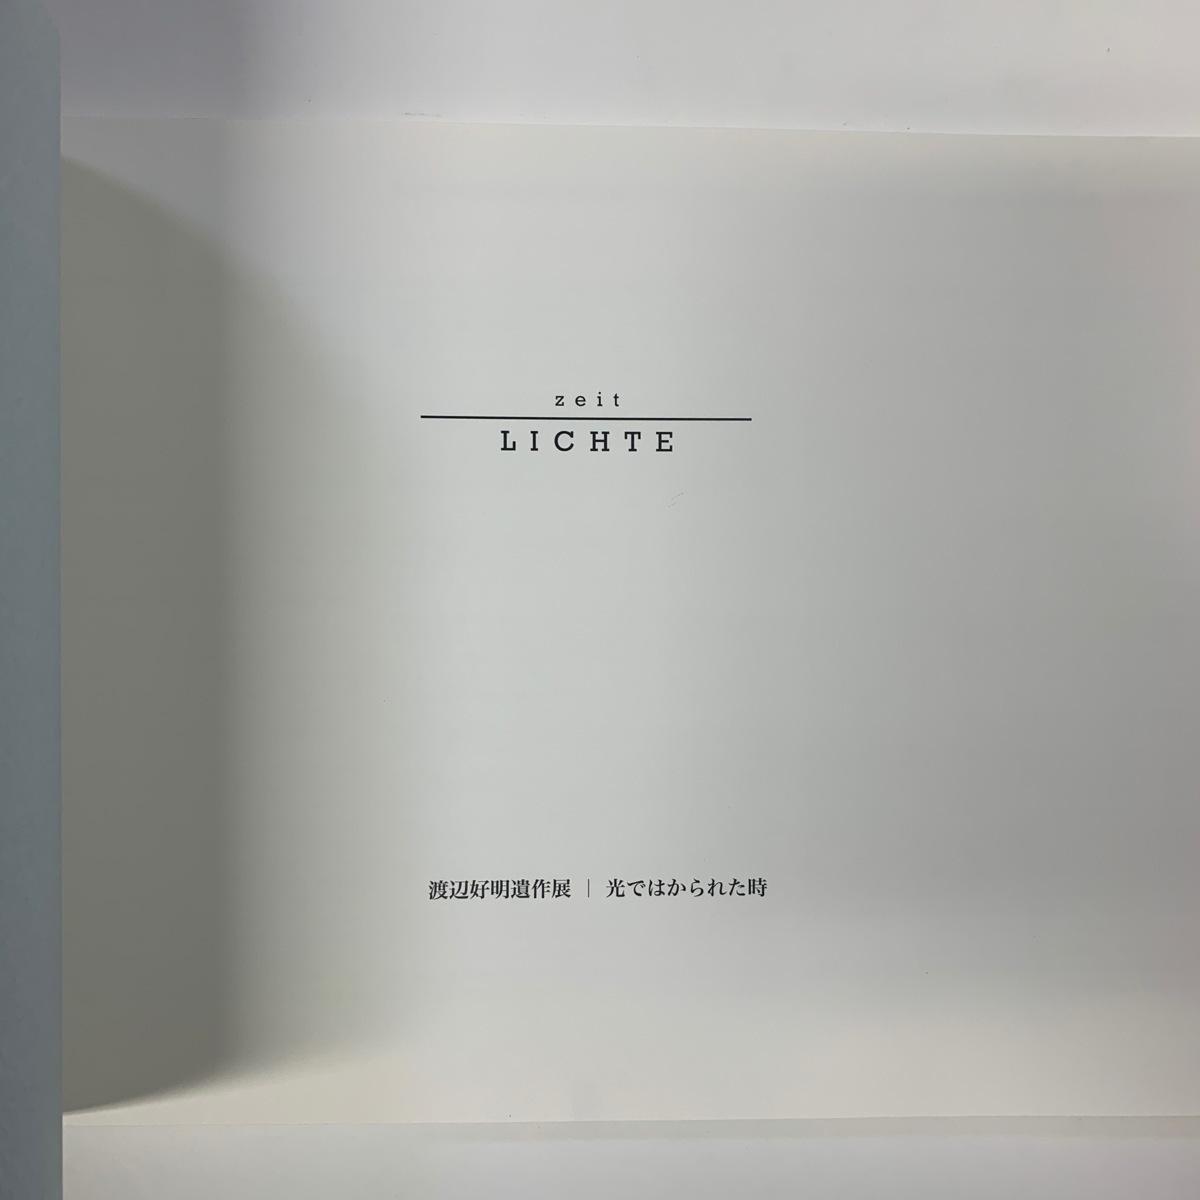 zeit / LIGHTE 渡辺好明遺作展 光ではかられた時 2012年 東京芸術大学美術館陳列館 <ゆうメール>_画像6